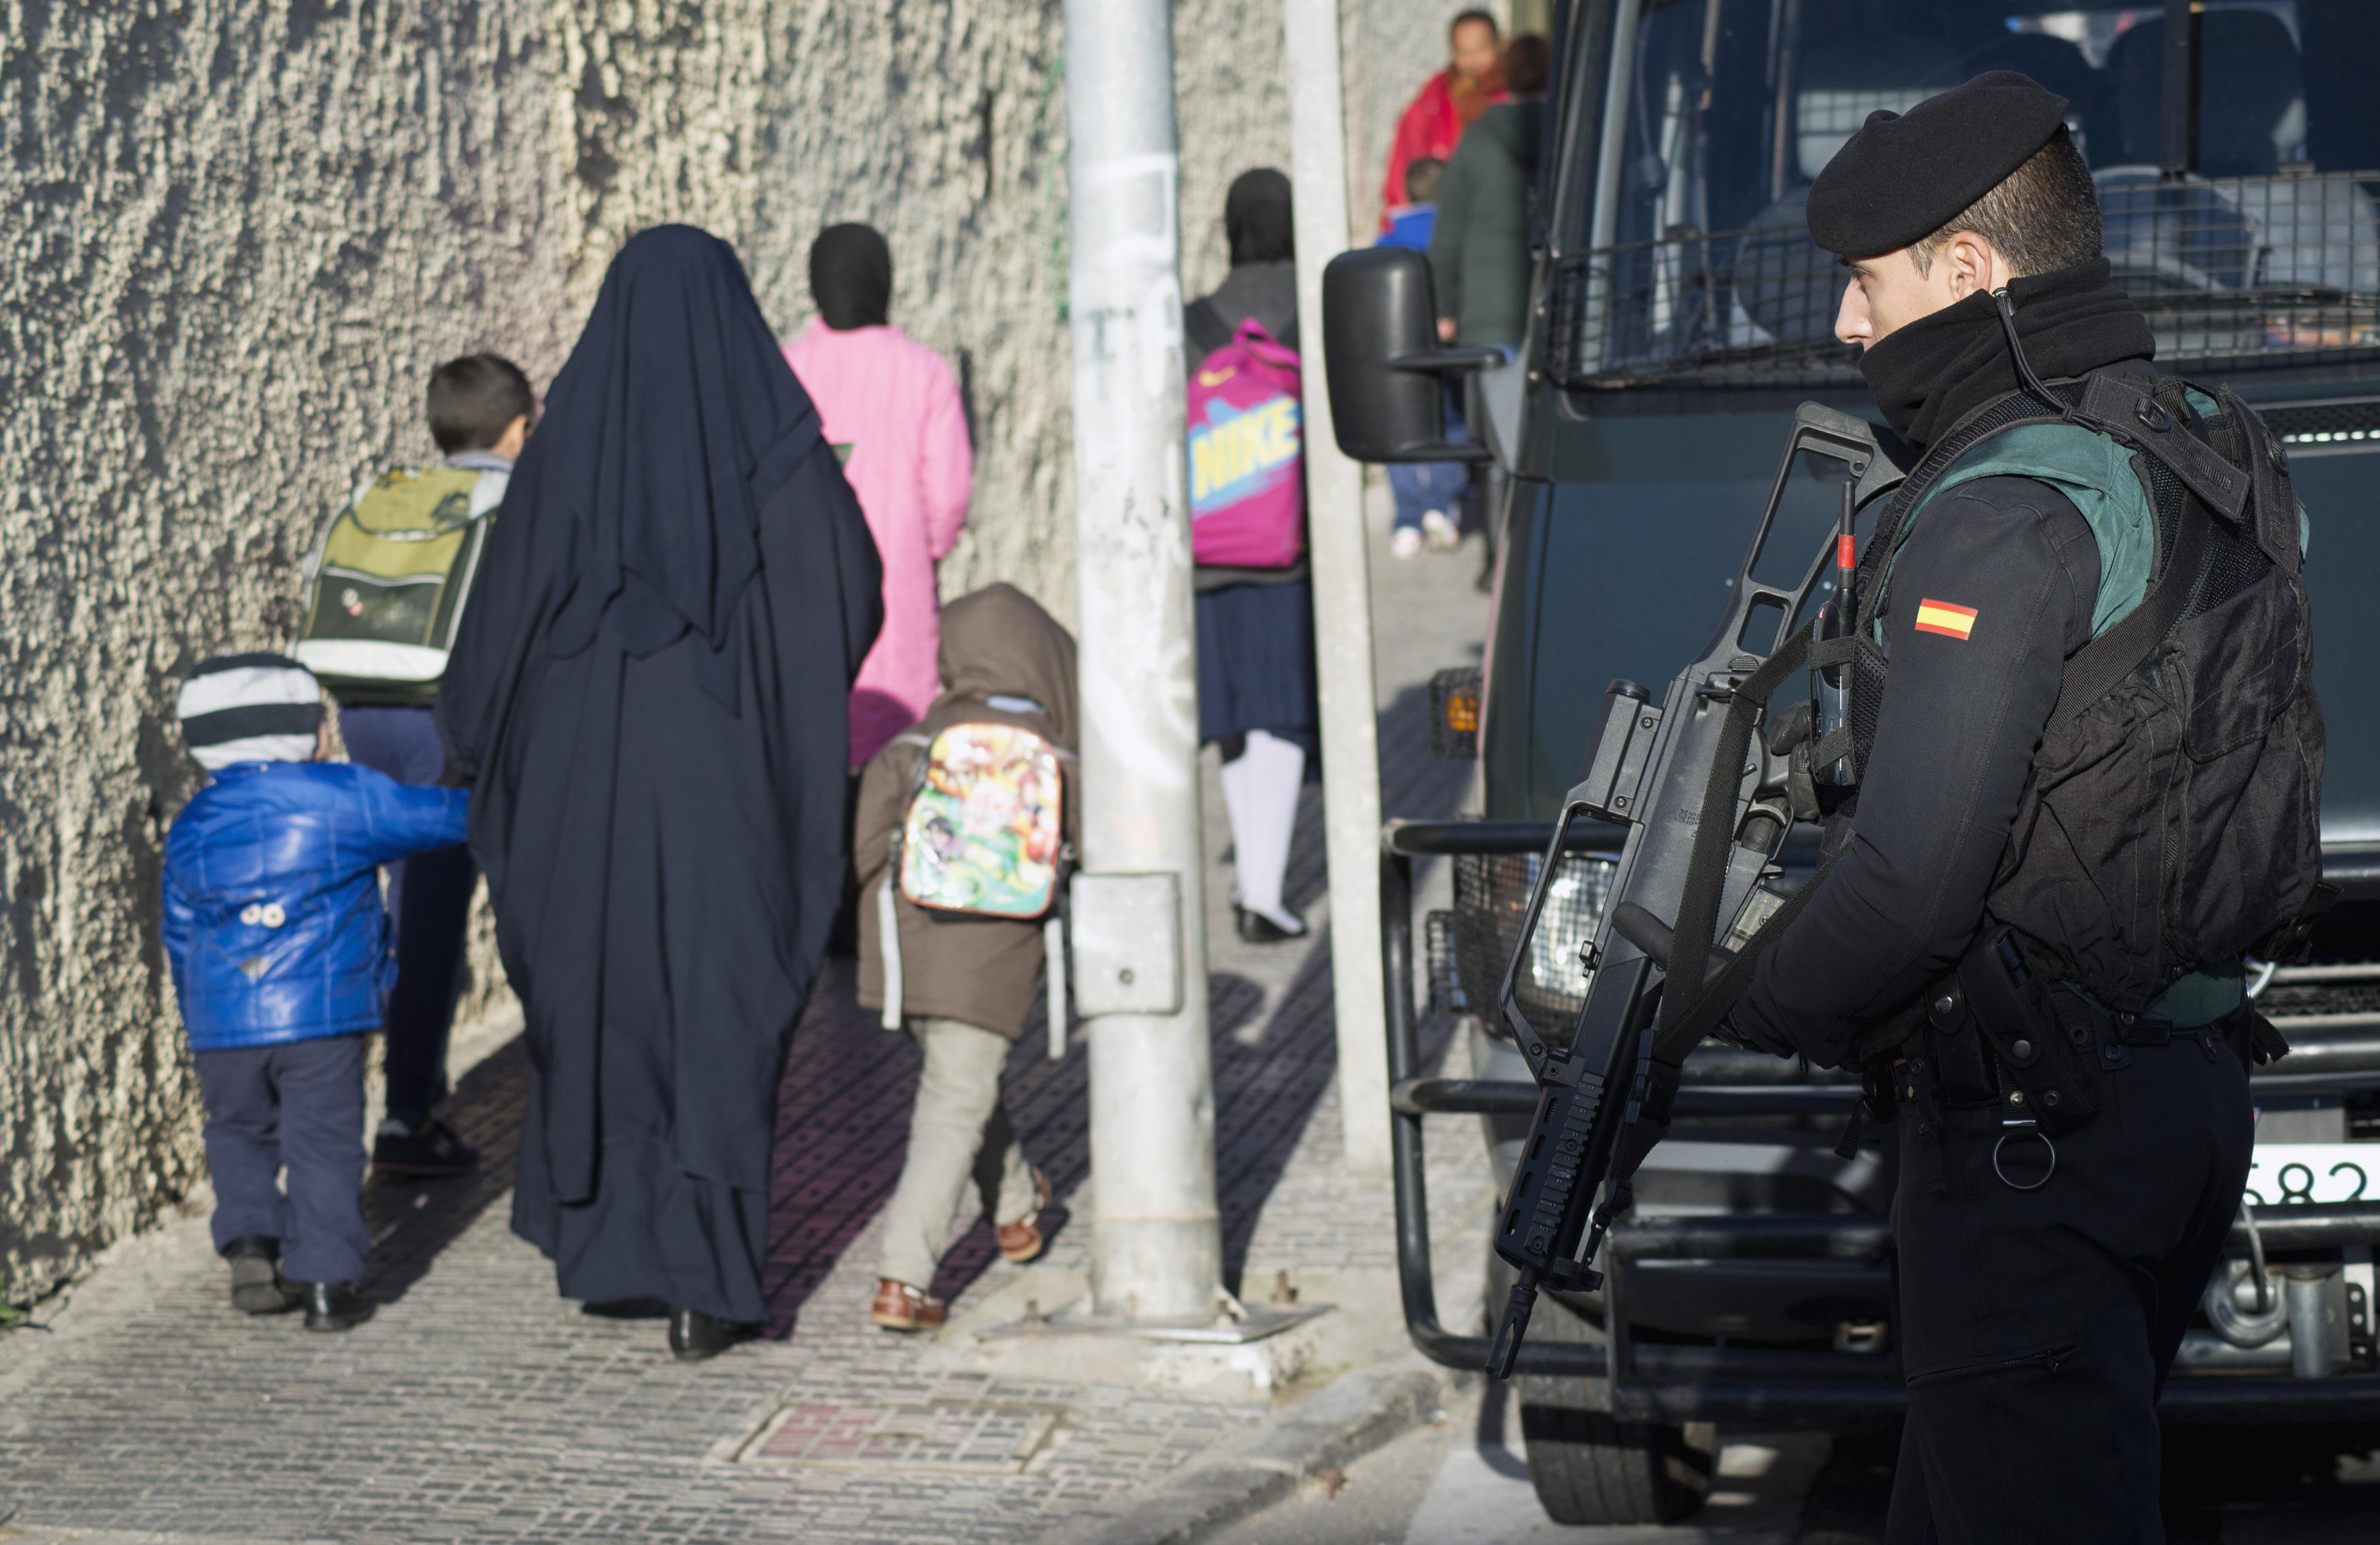 La yihad en familia. Foto: Reuters